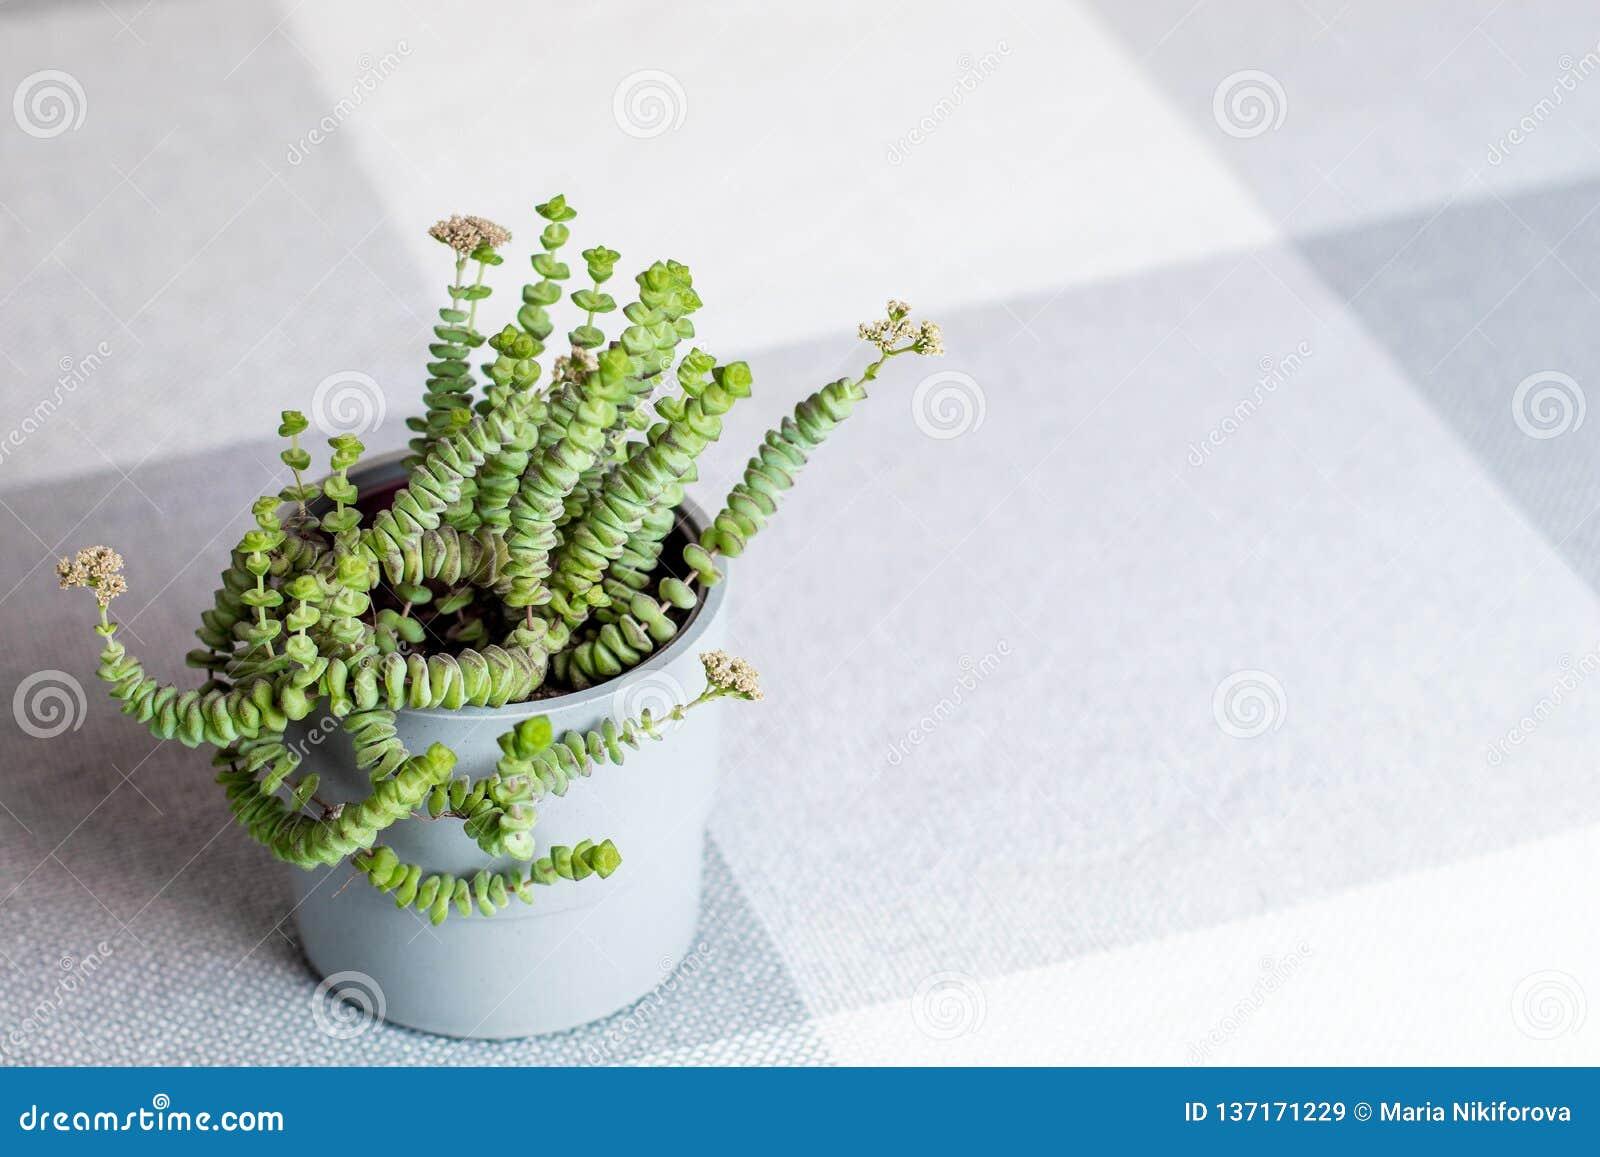 Fiore verde, crassula Nealeana, pianta succulente rara in un vaso grigio, copyspace